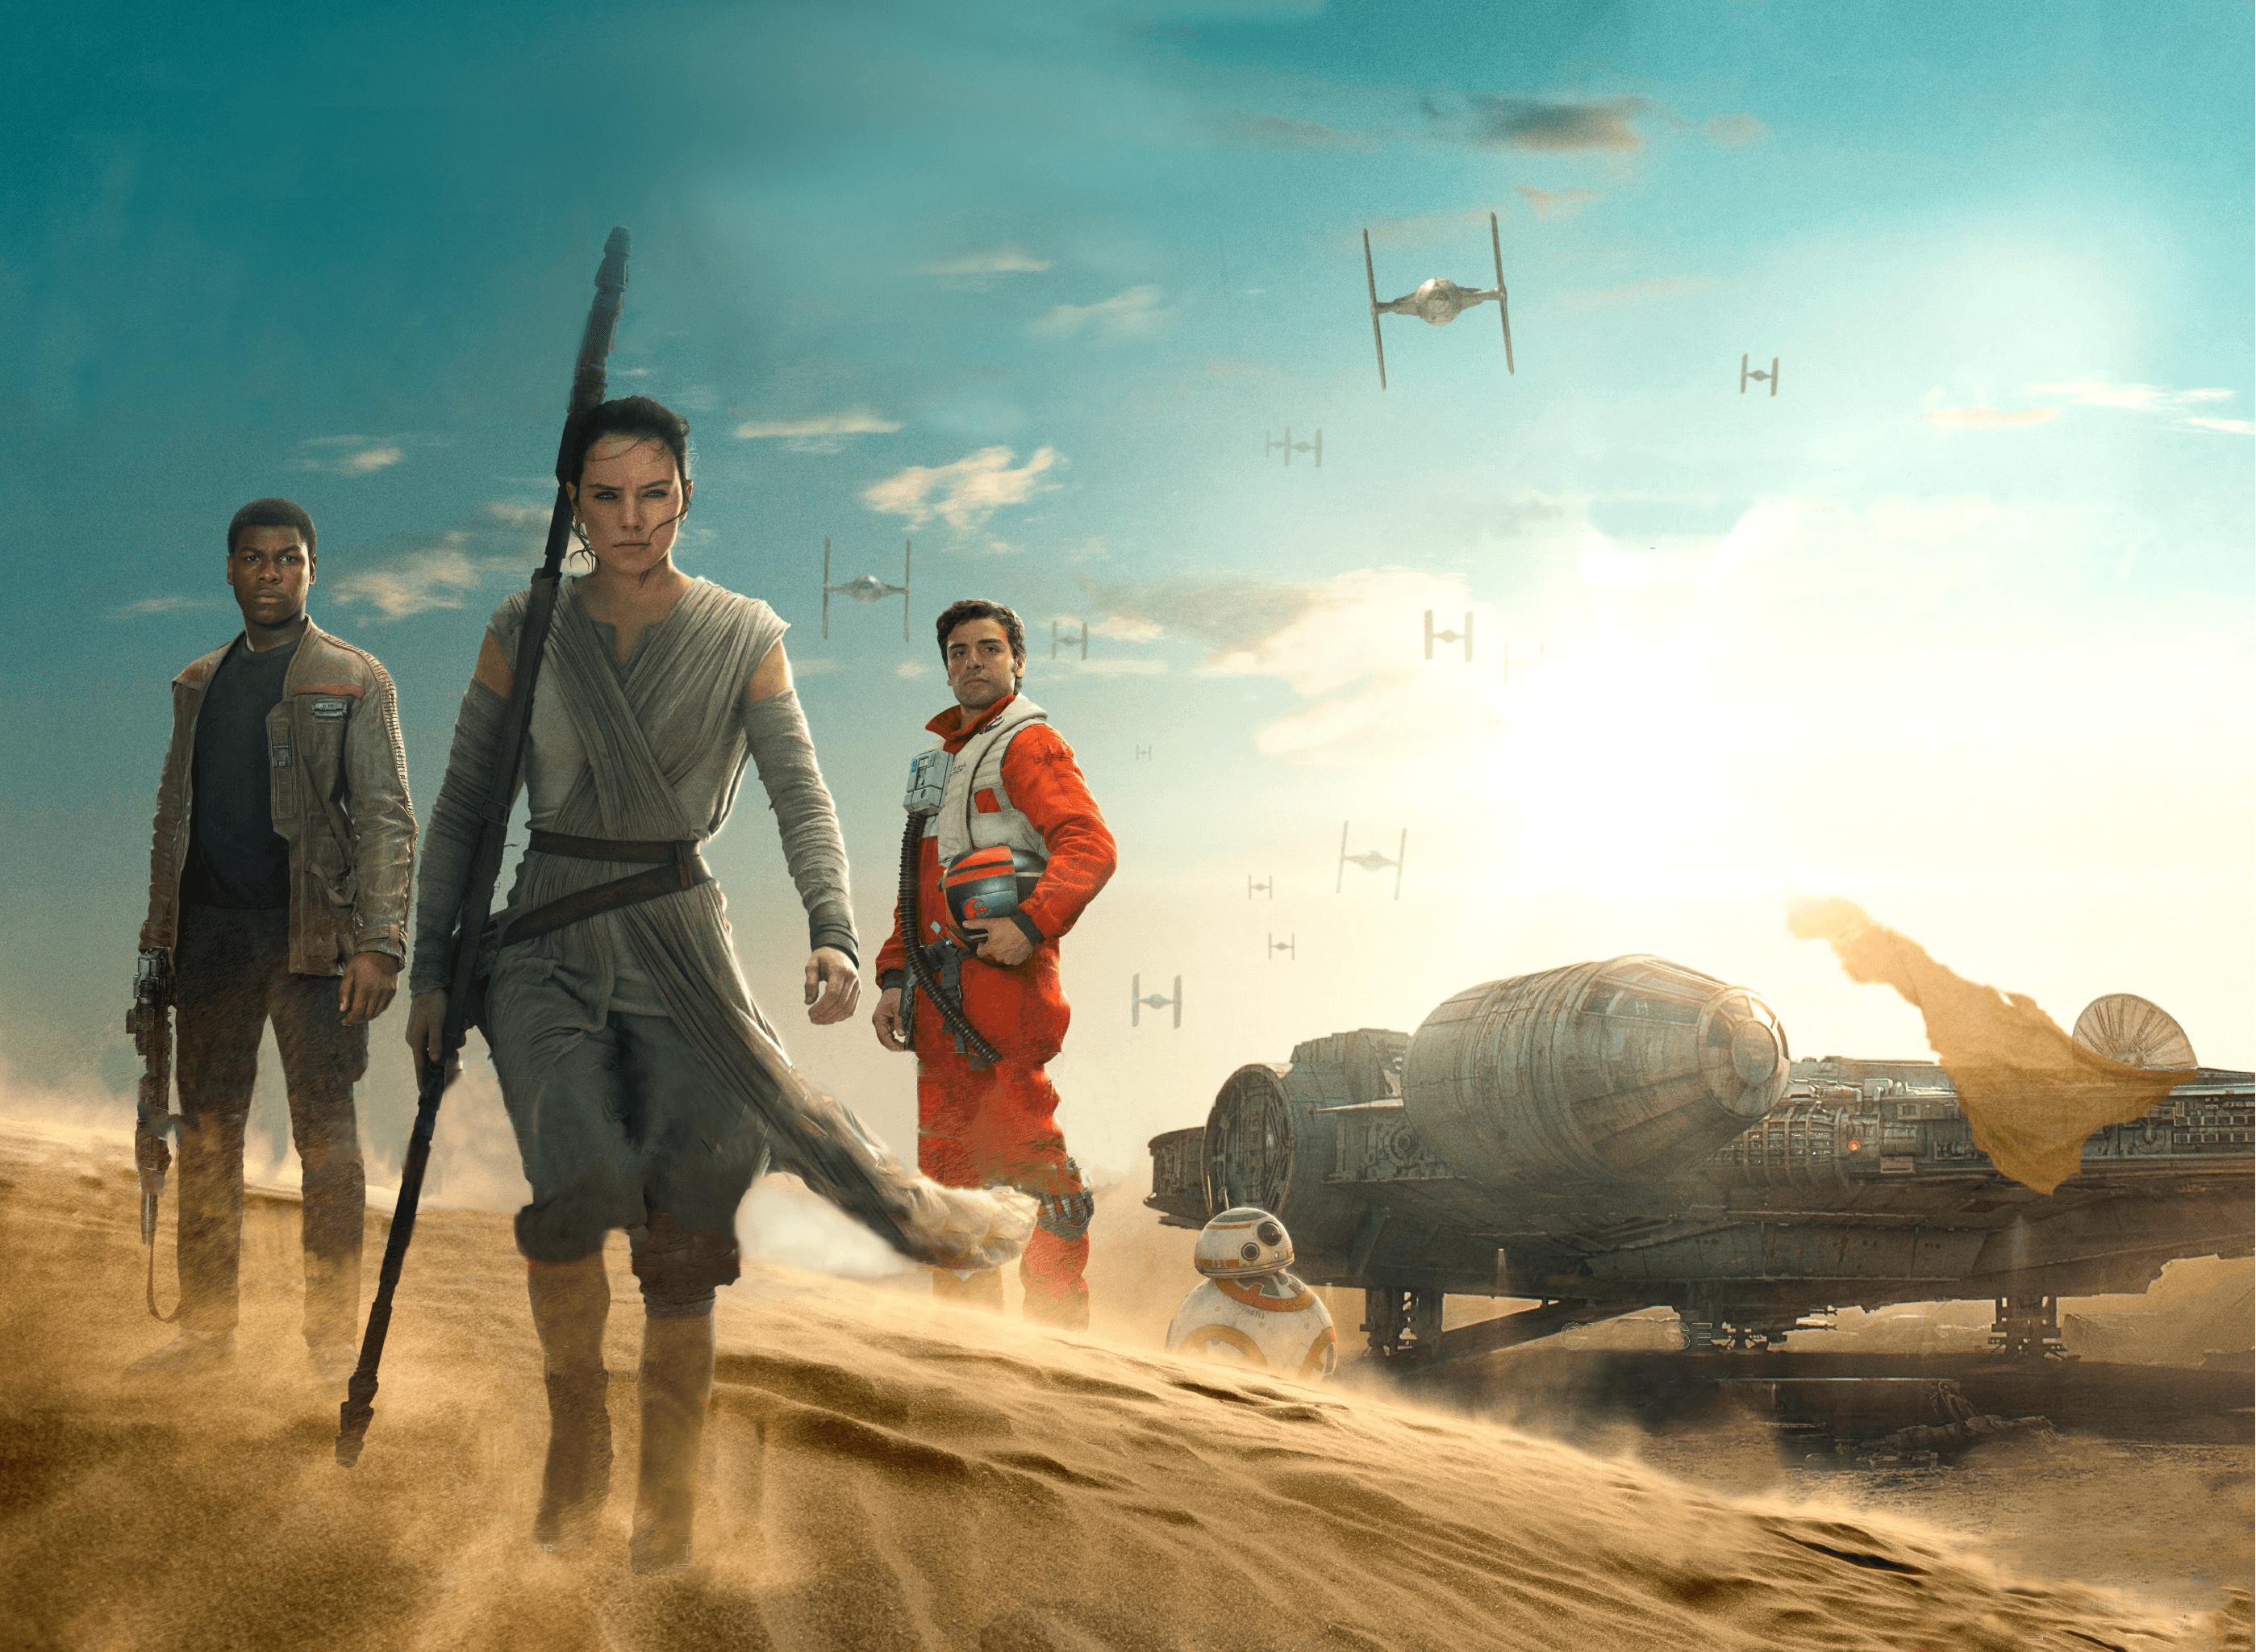 Rey Star Wars Wallpapers Top Free Rey Star Wars Backgrounds Wallpaperaccess